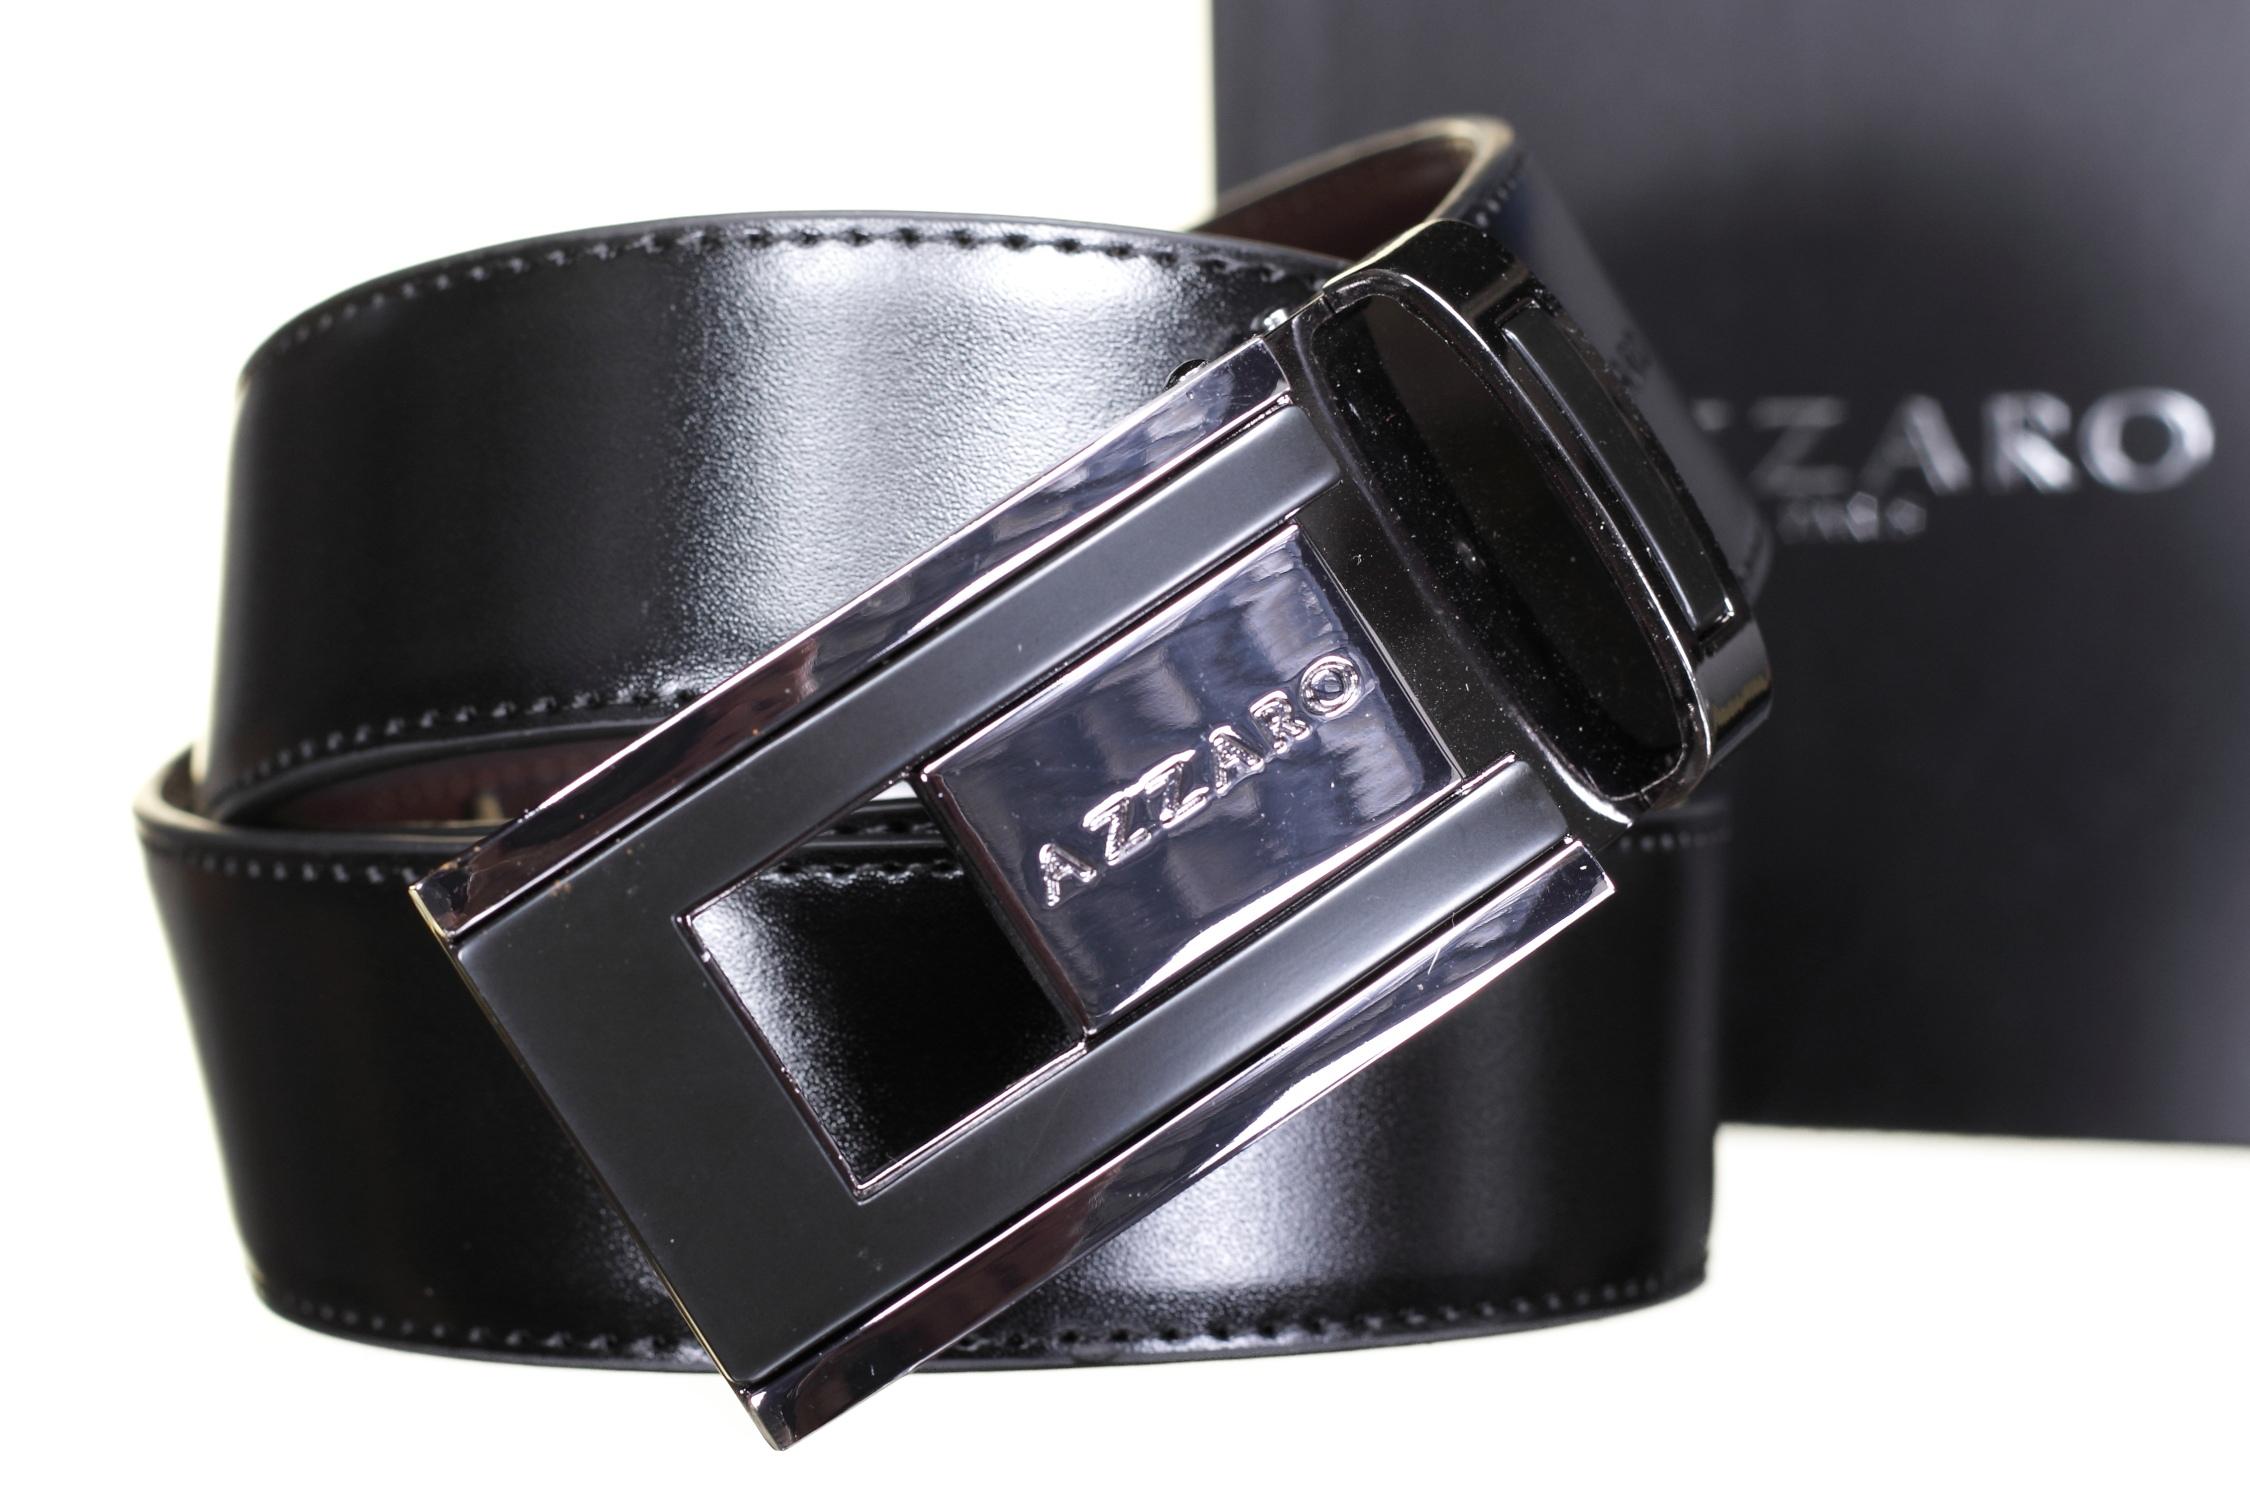 604bb4de57ee Ceinture Azzaro Large 91136 Reversible Noir Marron - Leader Mode -